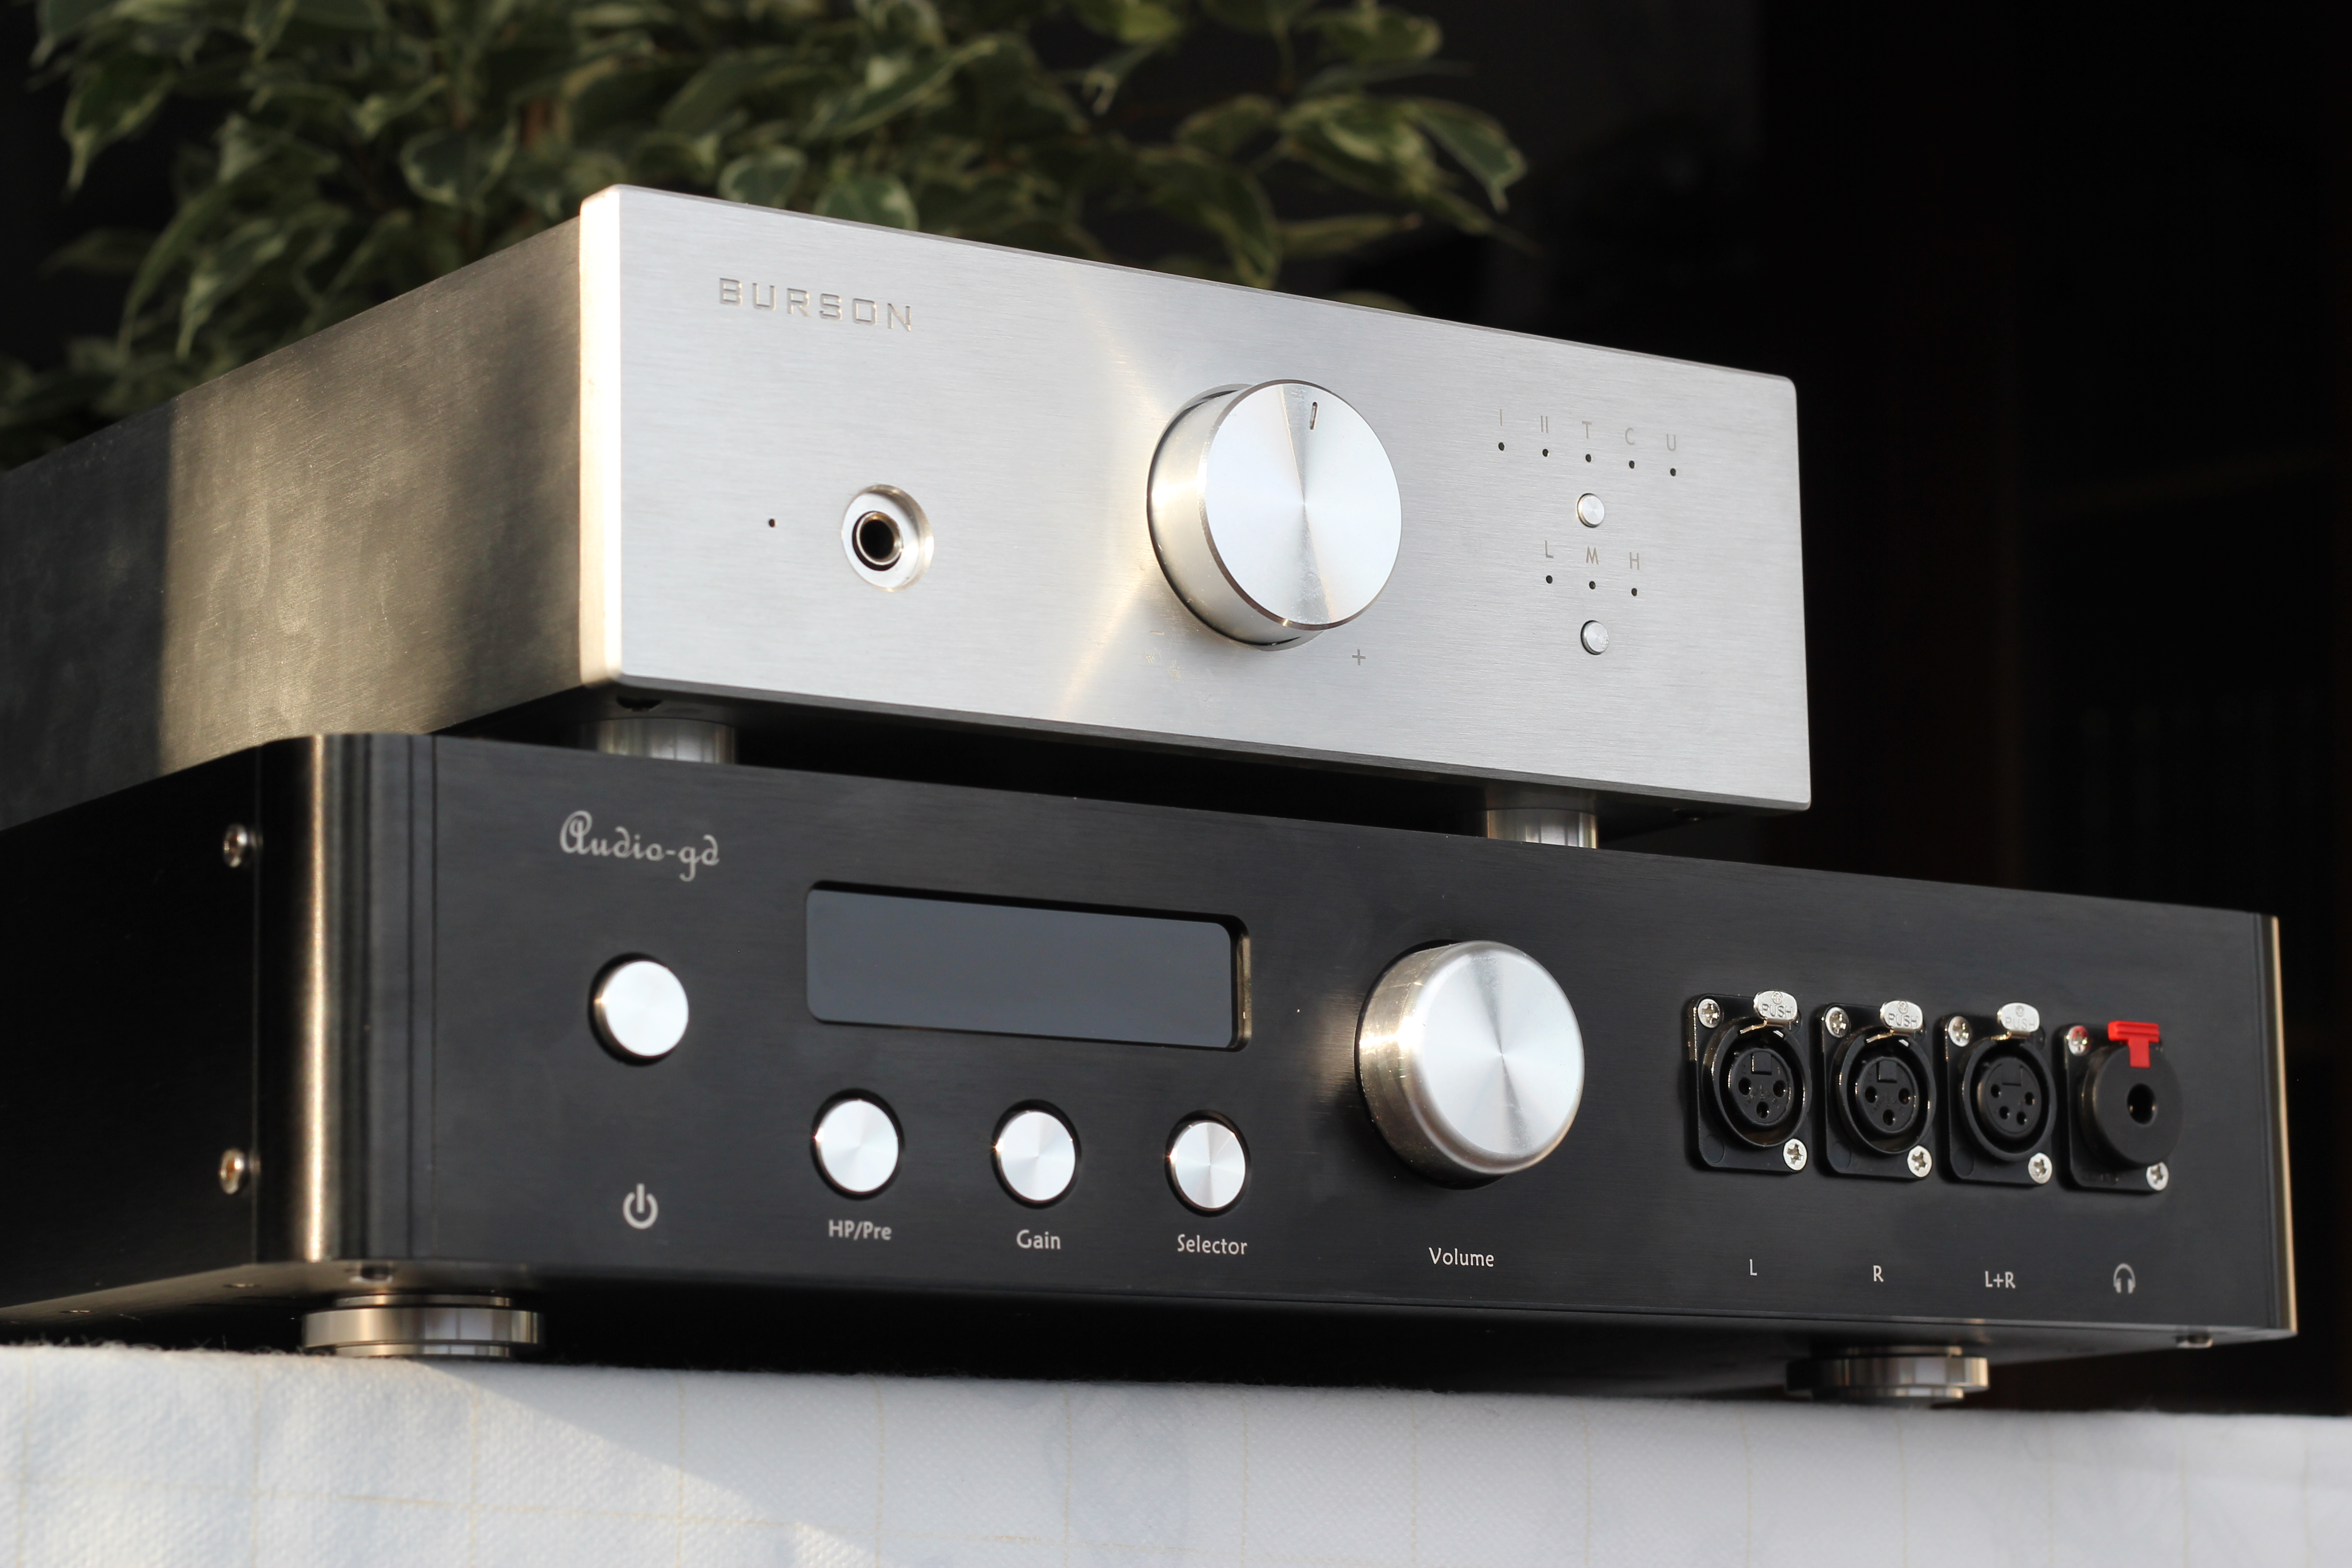 1851783cd93 Audio-gd Master 9 – Review | HeadMania